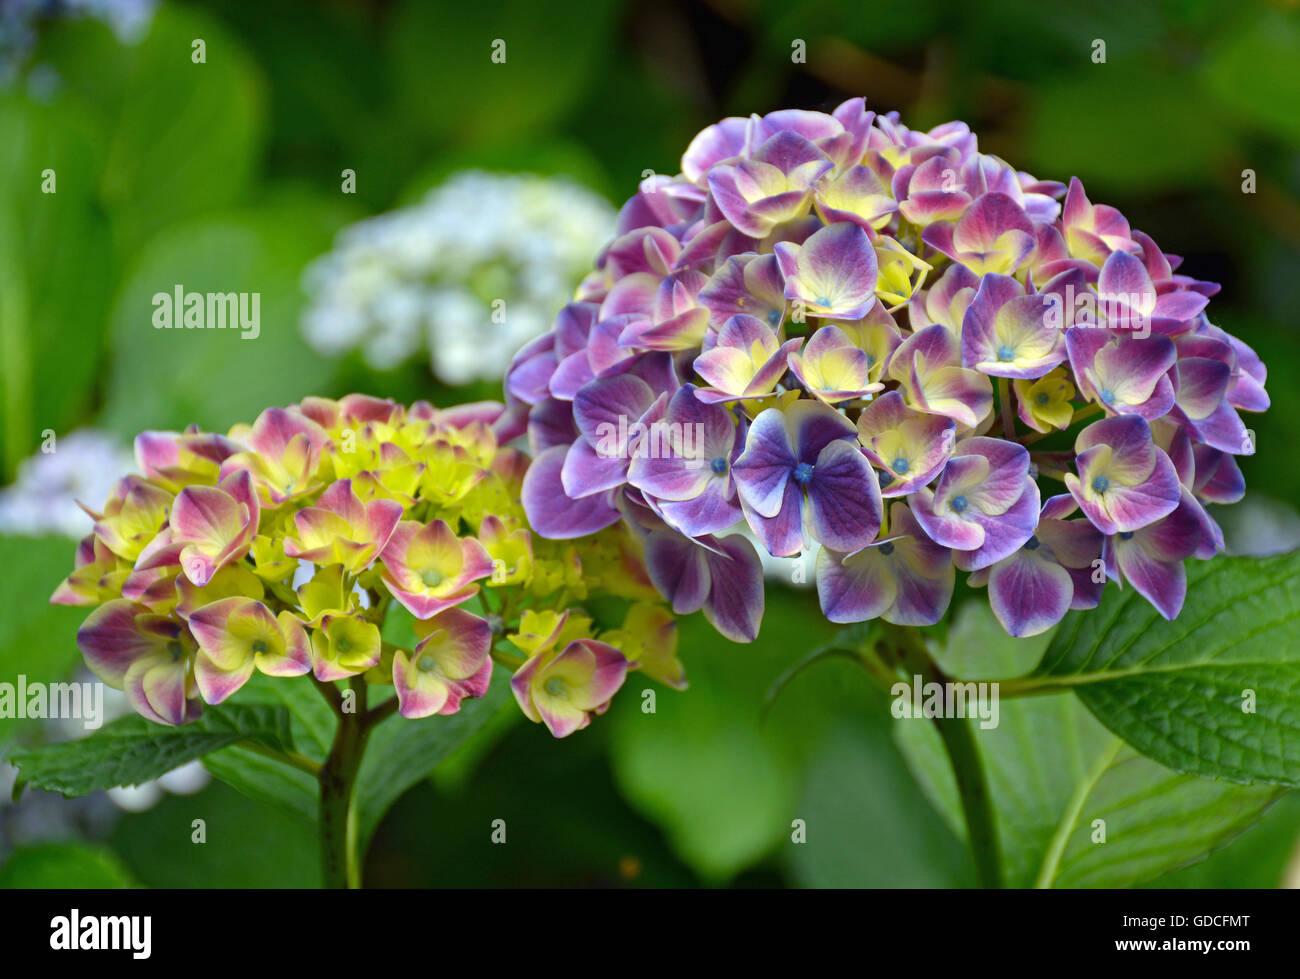 Beautiful pink yellow and purple hydrangea flowers stock photo beautiful pink yellow and purple hydrangea flowers mightylinksfo